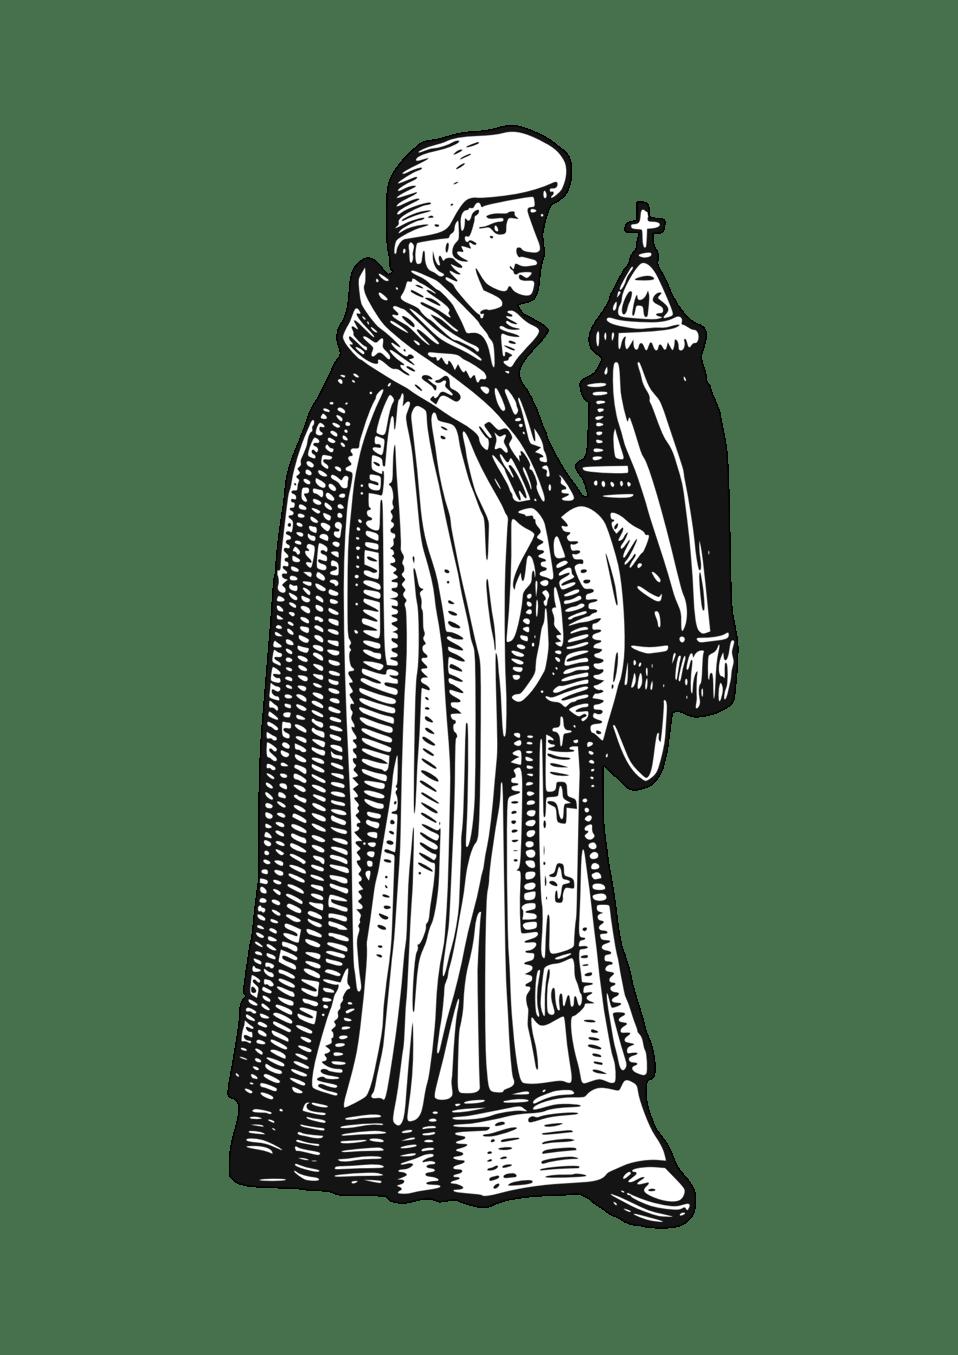 medium resolution of medieval priest with sacrament